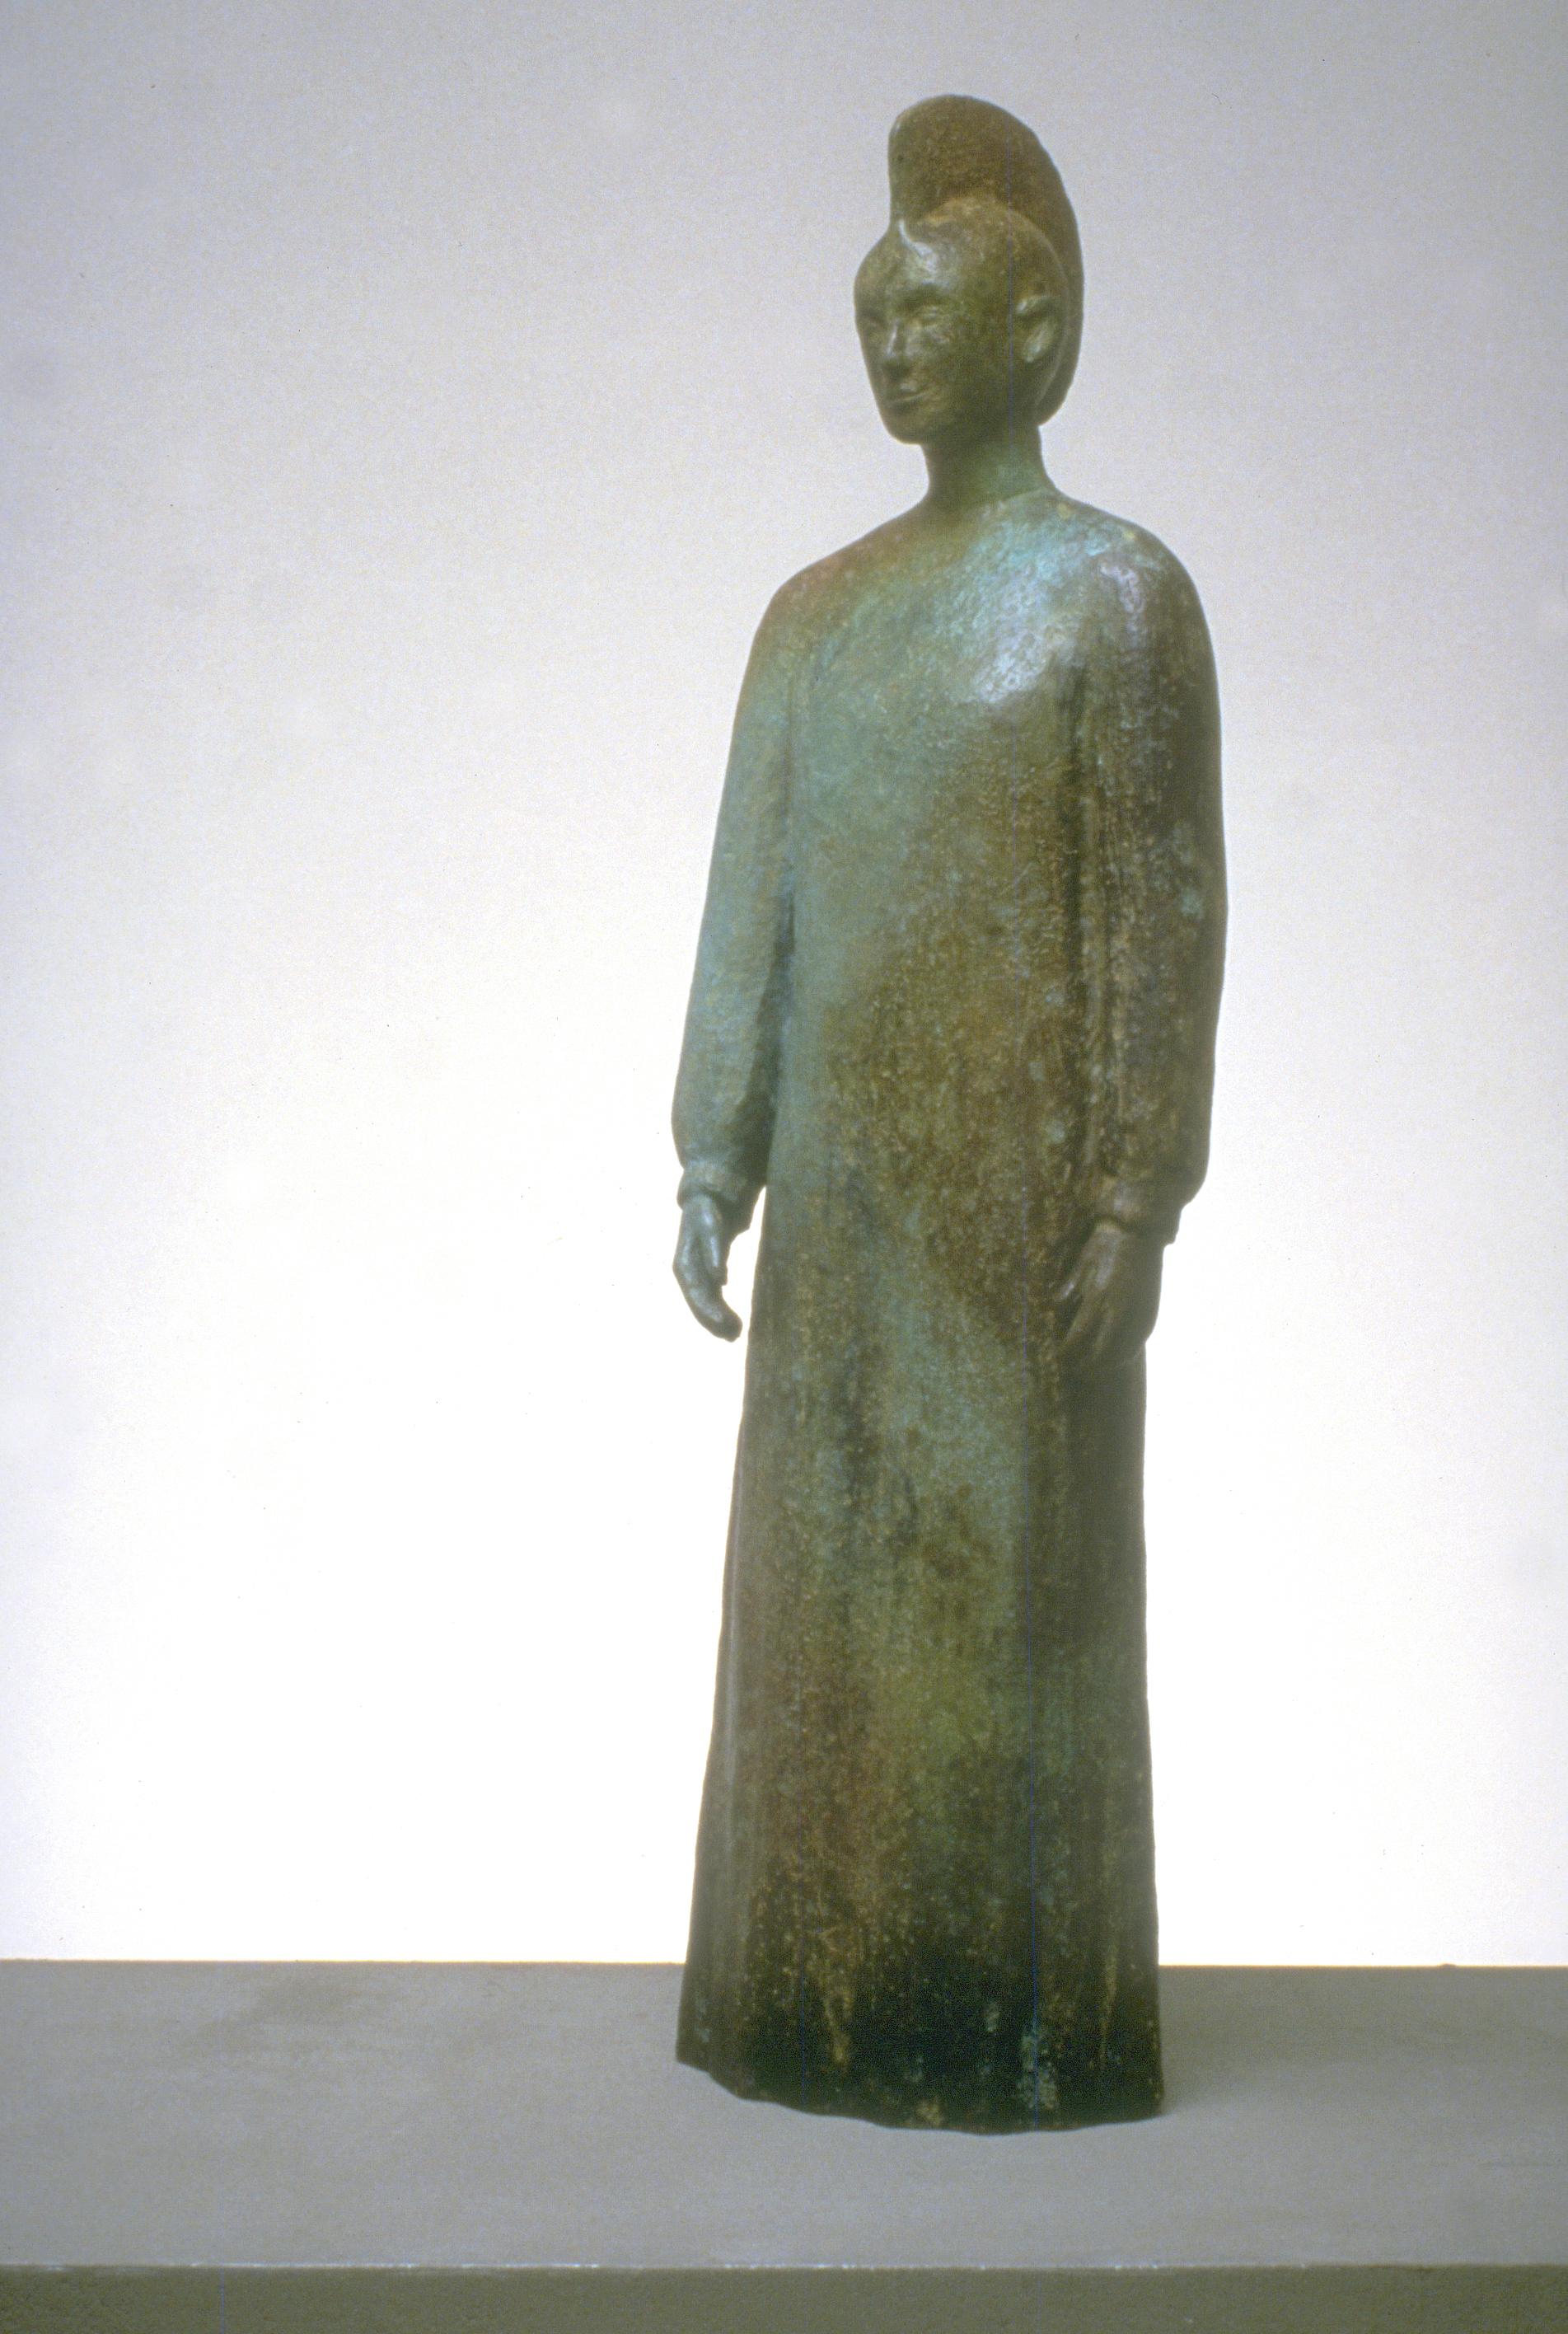 Haniwa Standing Figure (Terpsichore)